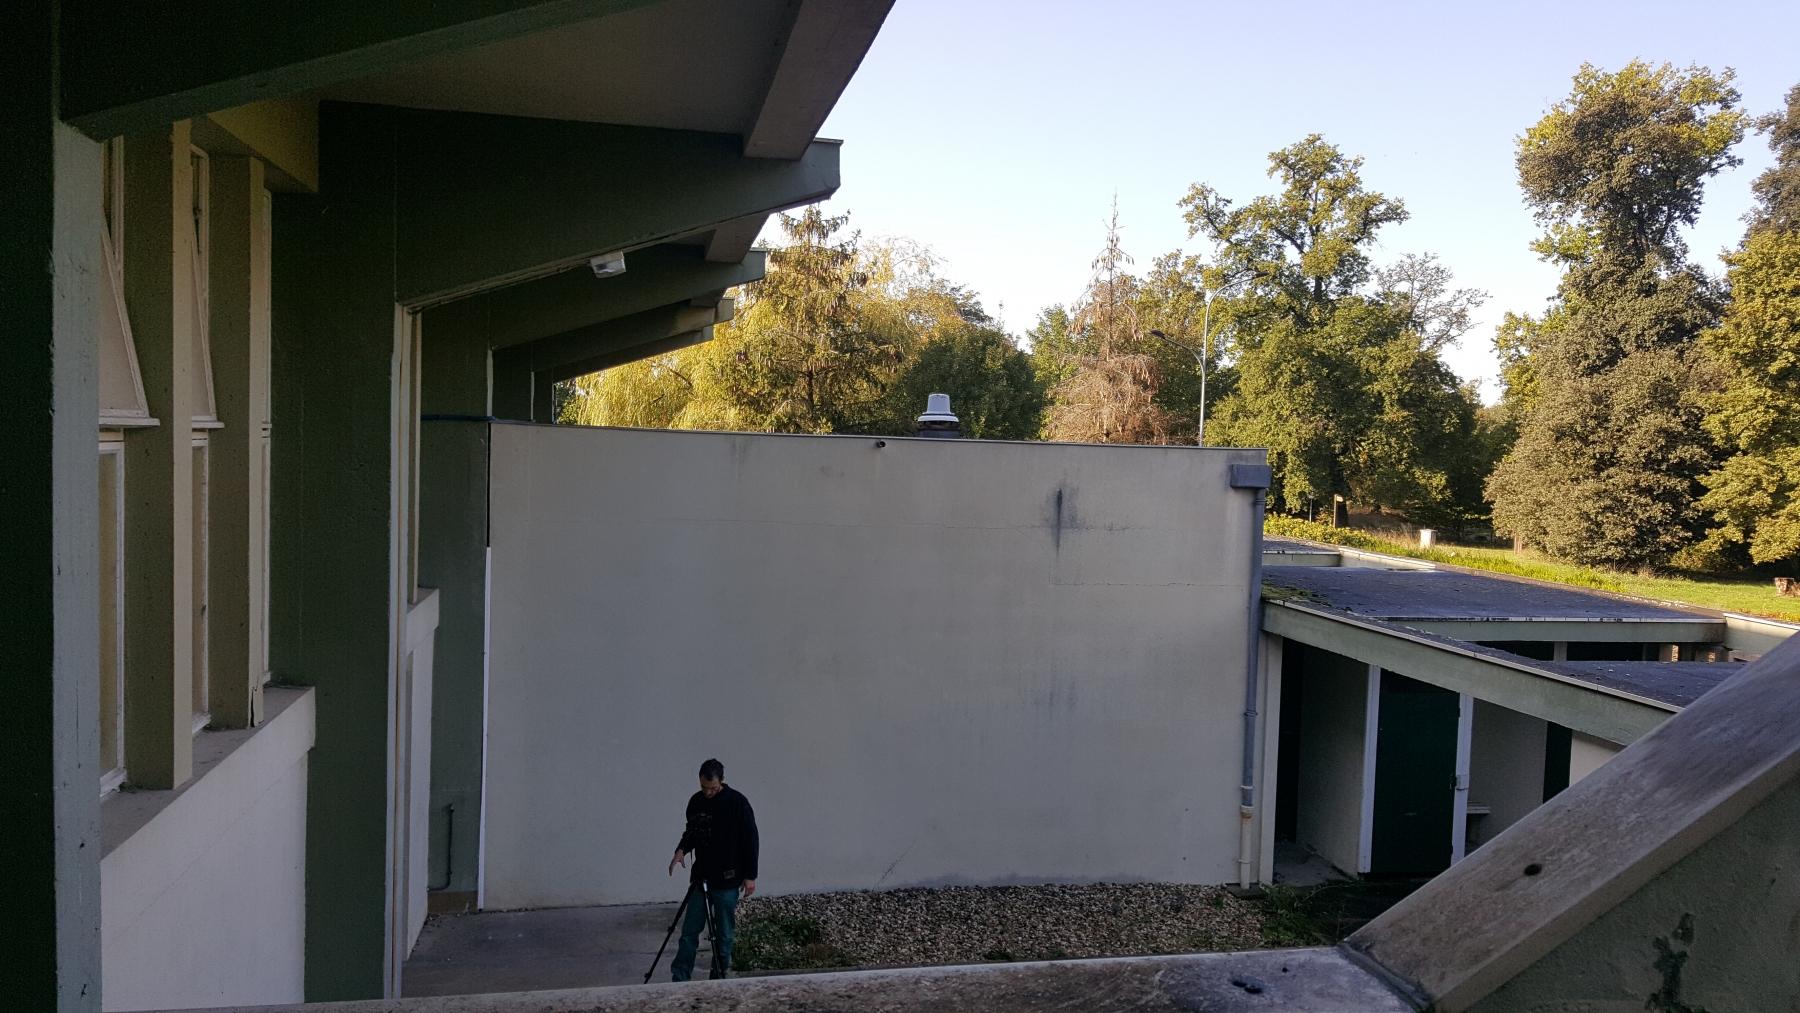 18_GALLERIE-LEPEDILUVE-COGNAC-PISCINE-ASSOCITION-GRAFFITI-ART-EXPO-CONCERT-COLLECTIF-ARTISTE